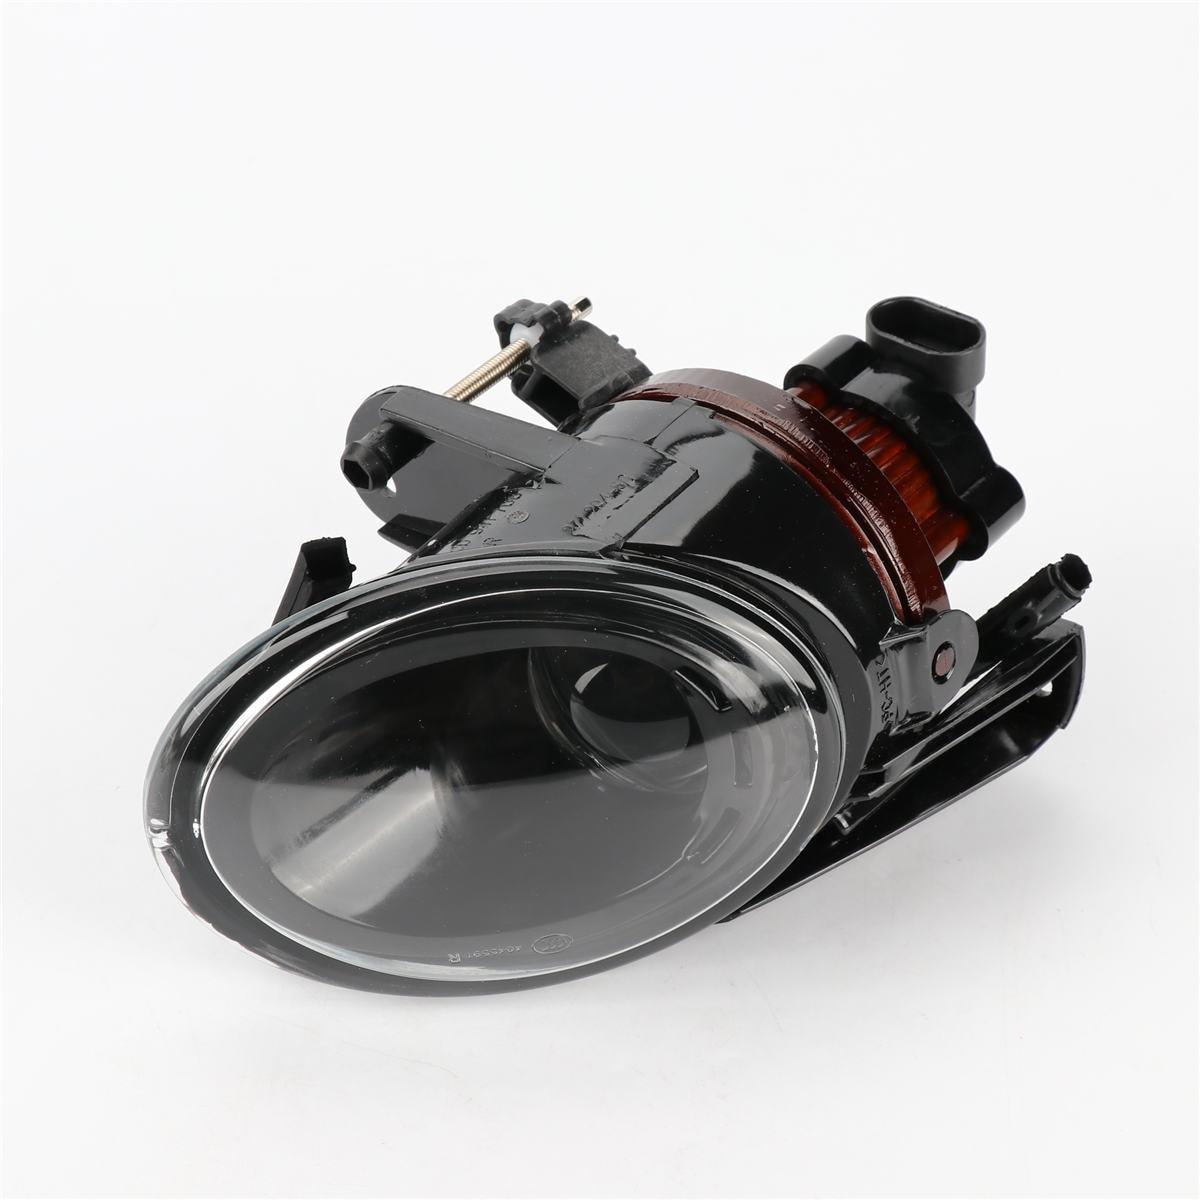 1PCS Bumper Projection Convex Lens Headlights Fog Lamp Front Right Side For VW Passat B6 3C 3C0 941 700 1pcs front halogen foglamps clear glass lens front fog light driving lamp for volkswagen passat b6 for right side